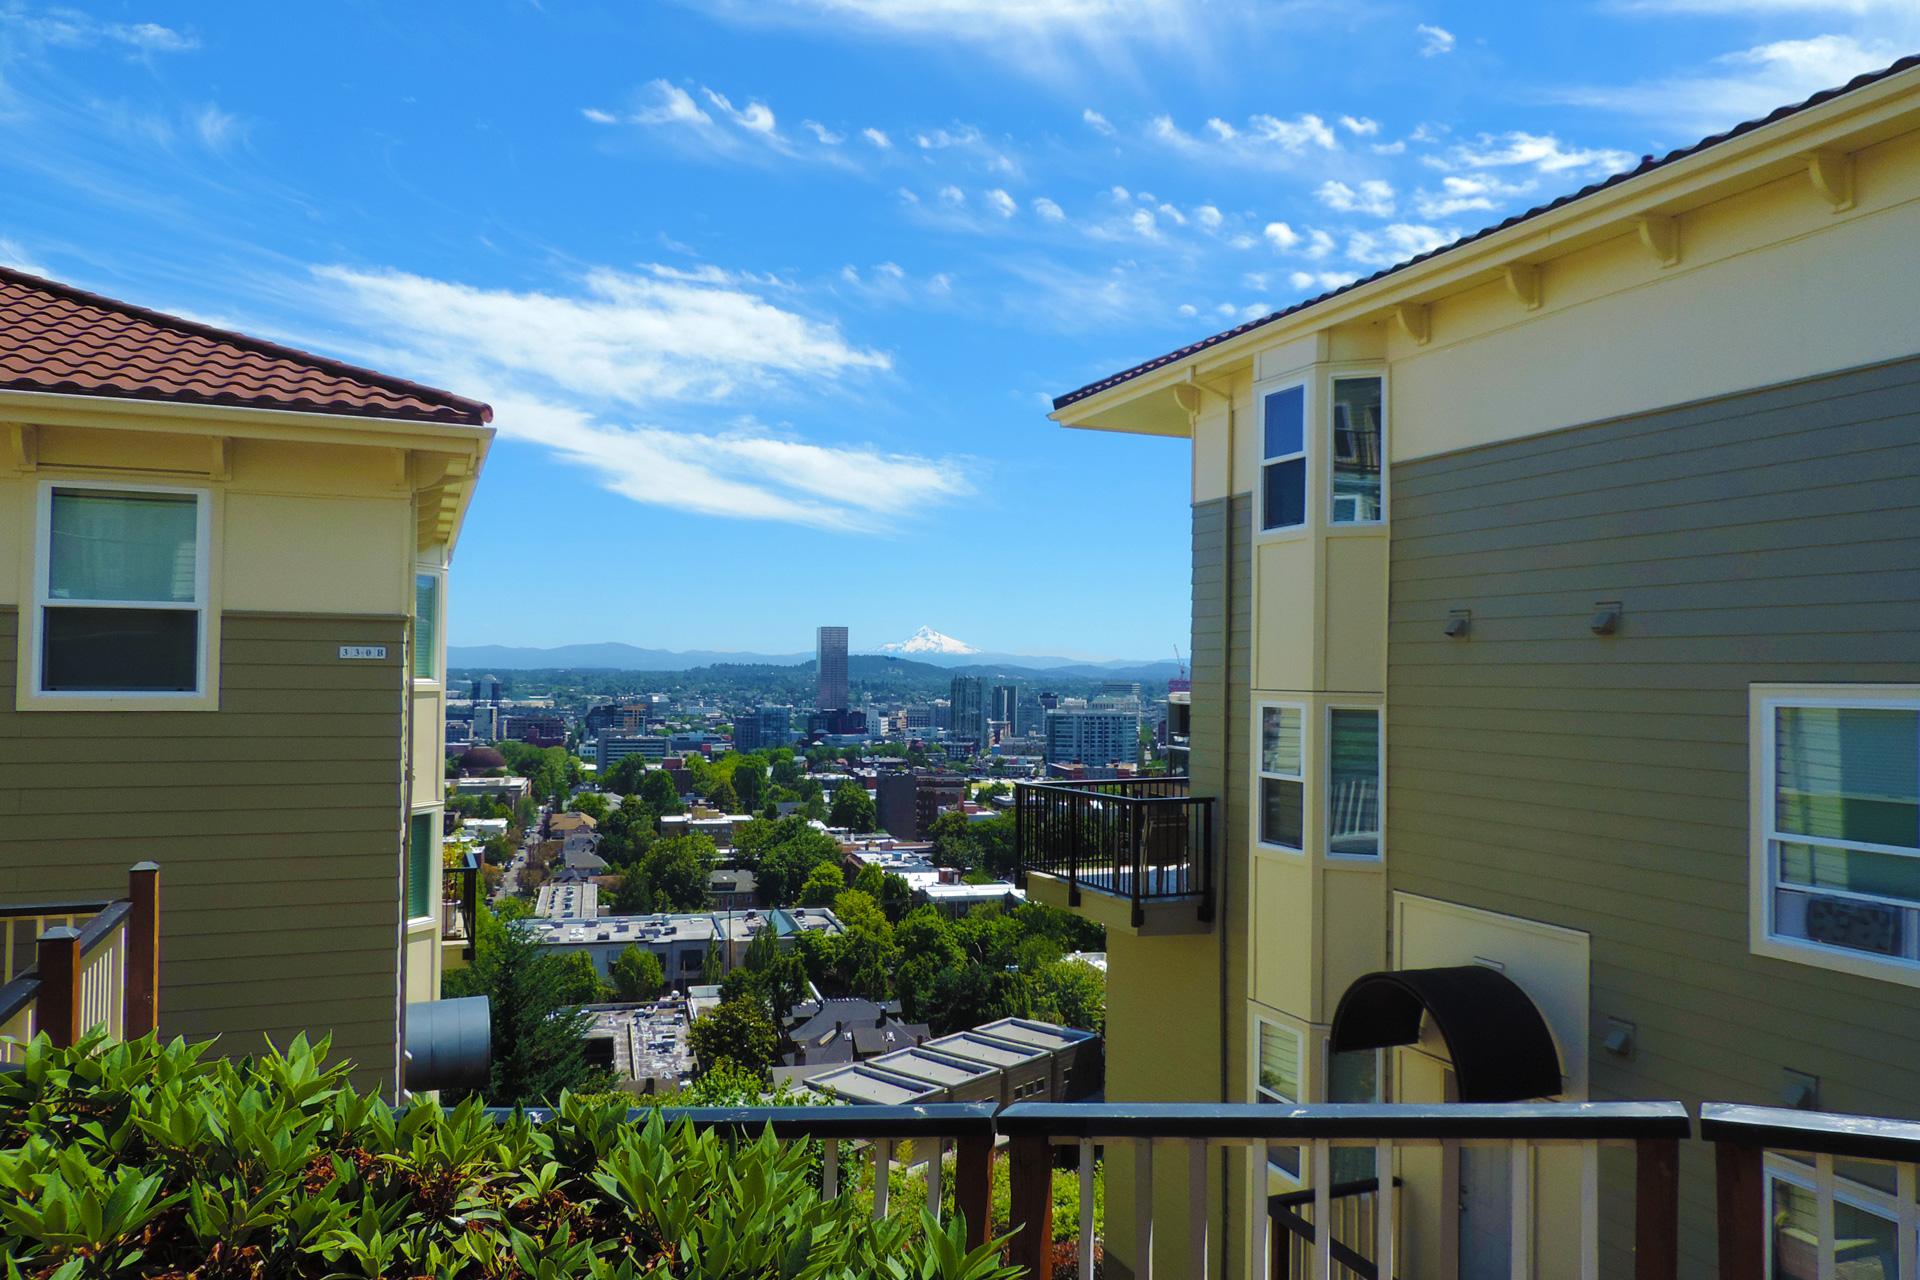 hilltop-condominiums-uptown-image-5